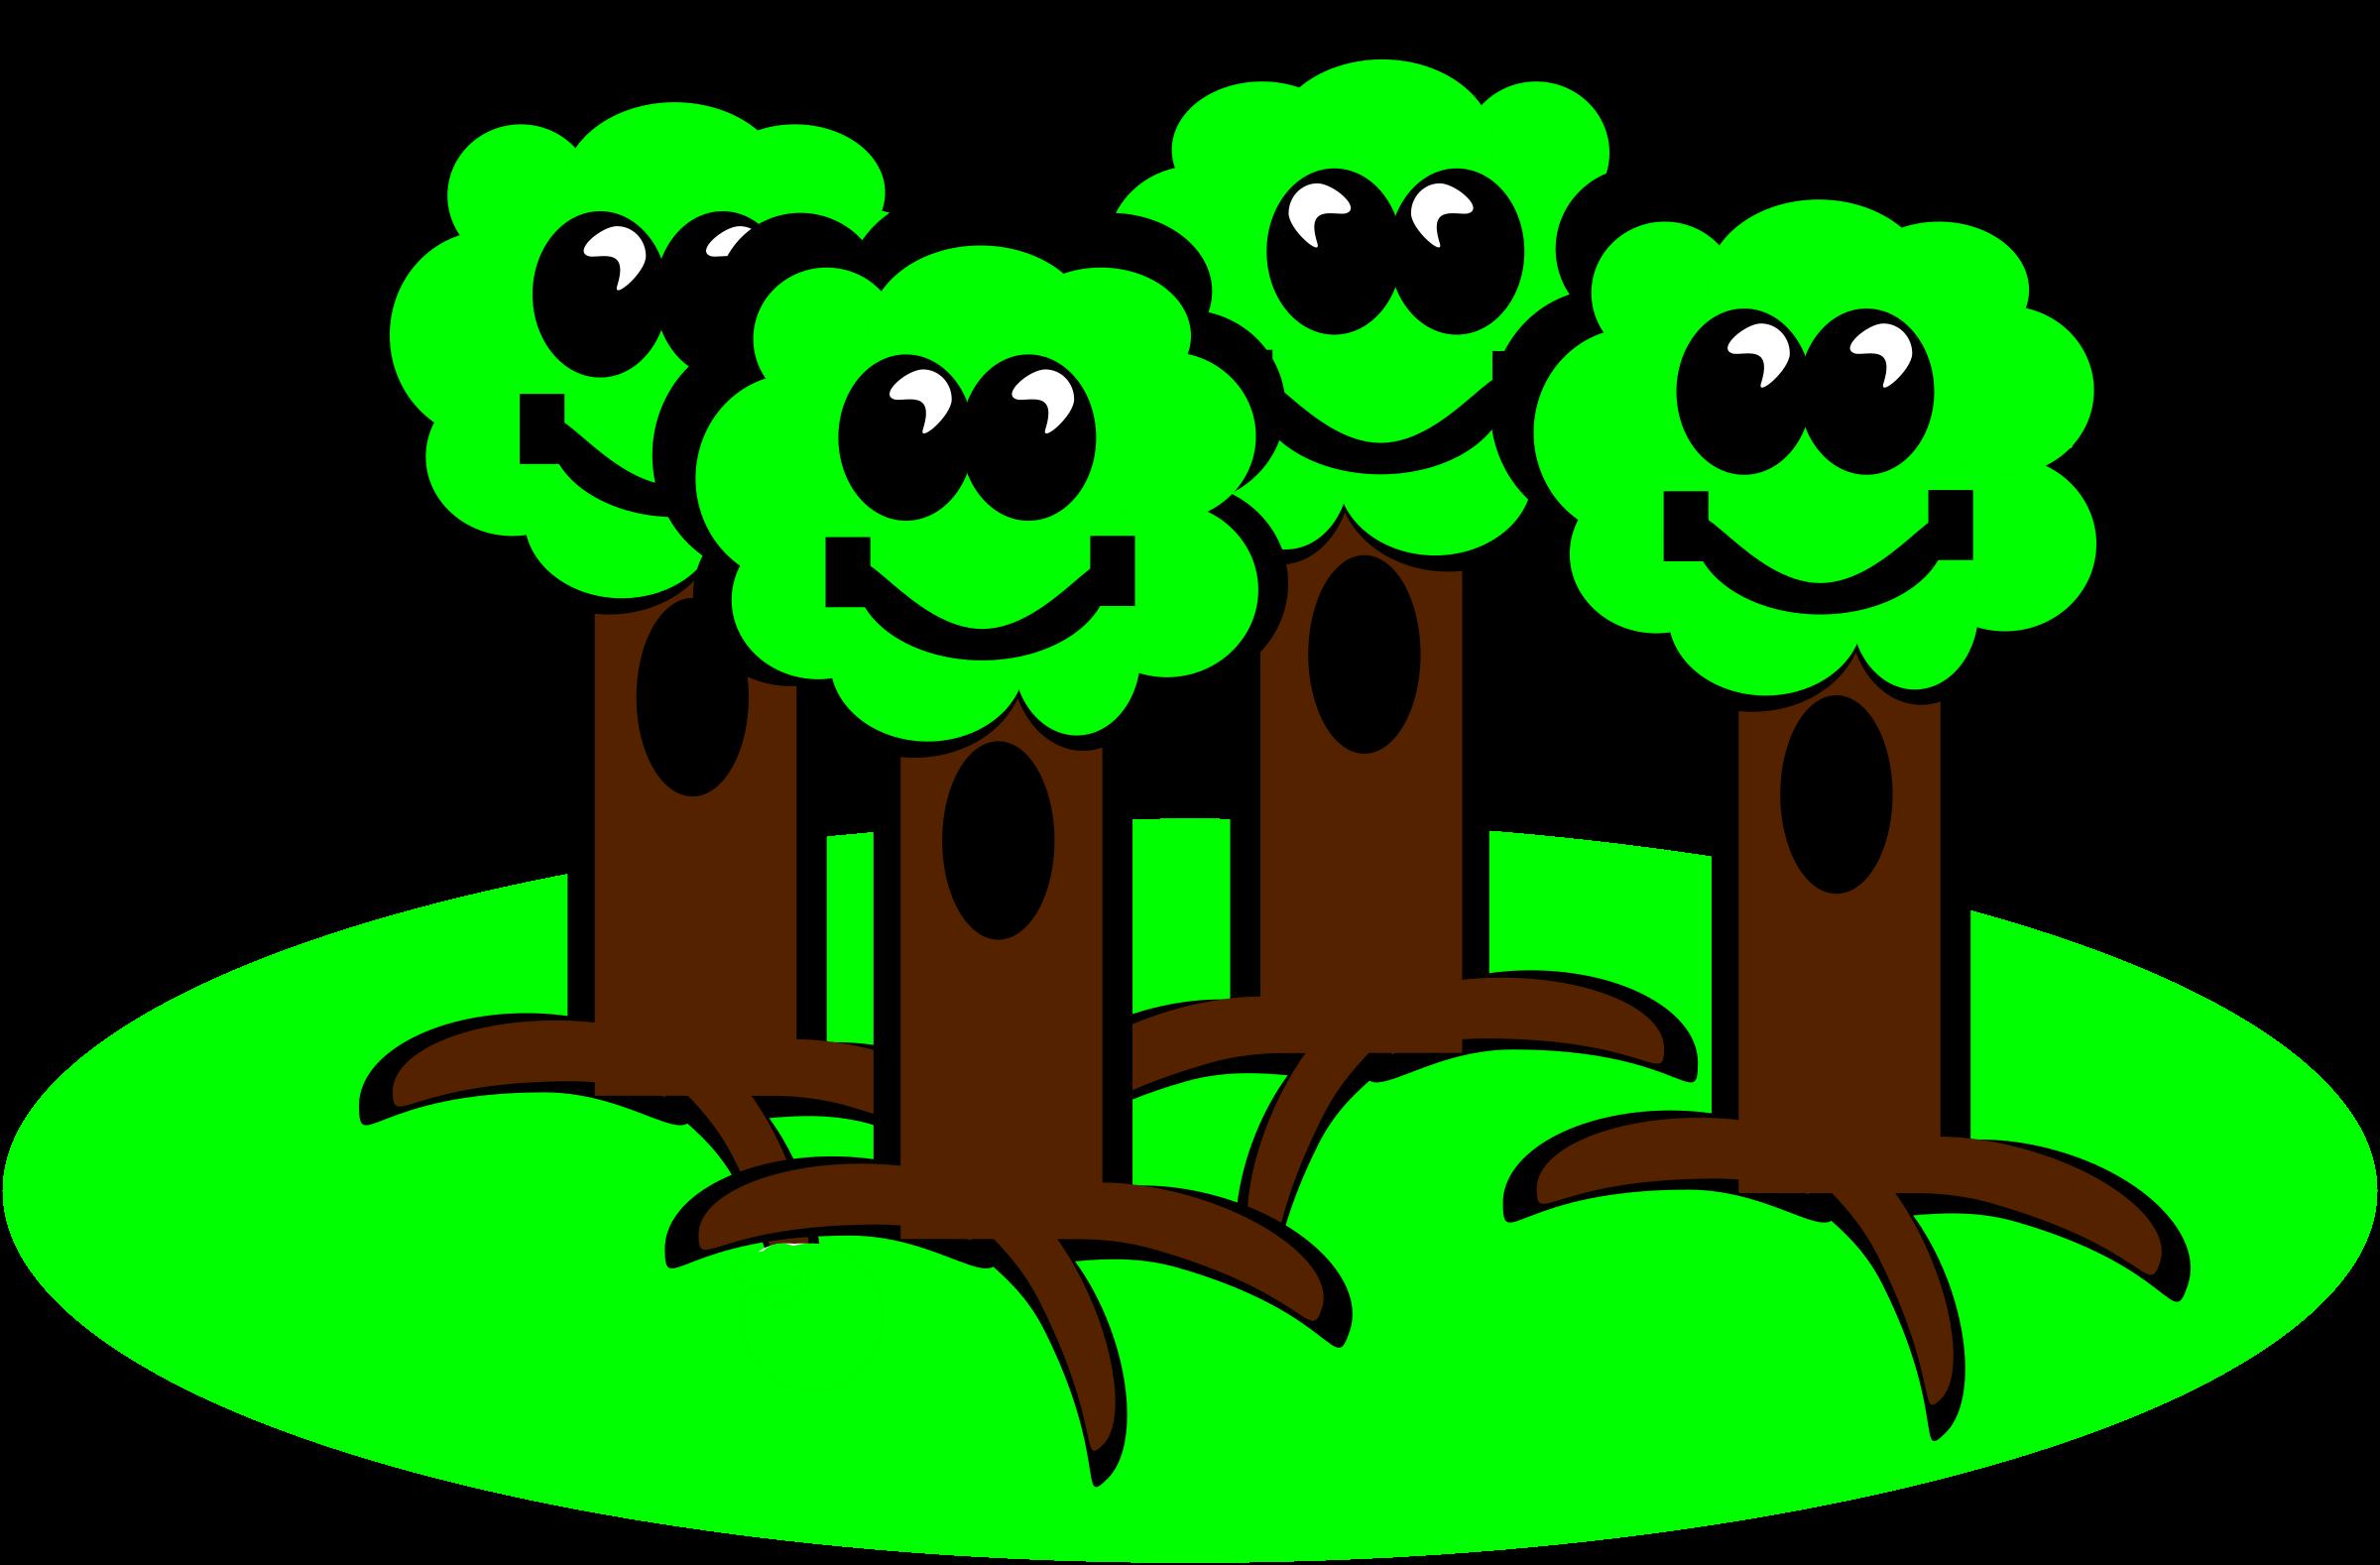 Happy trees big image. Clipart smile tree